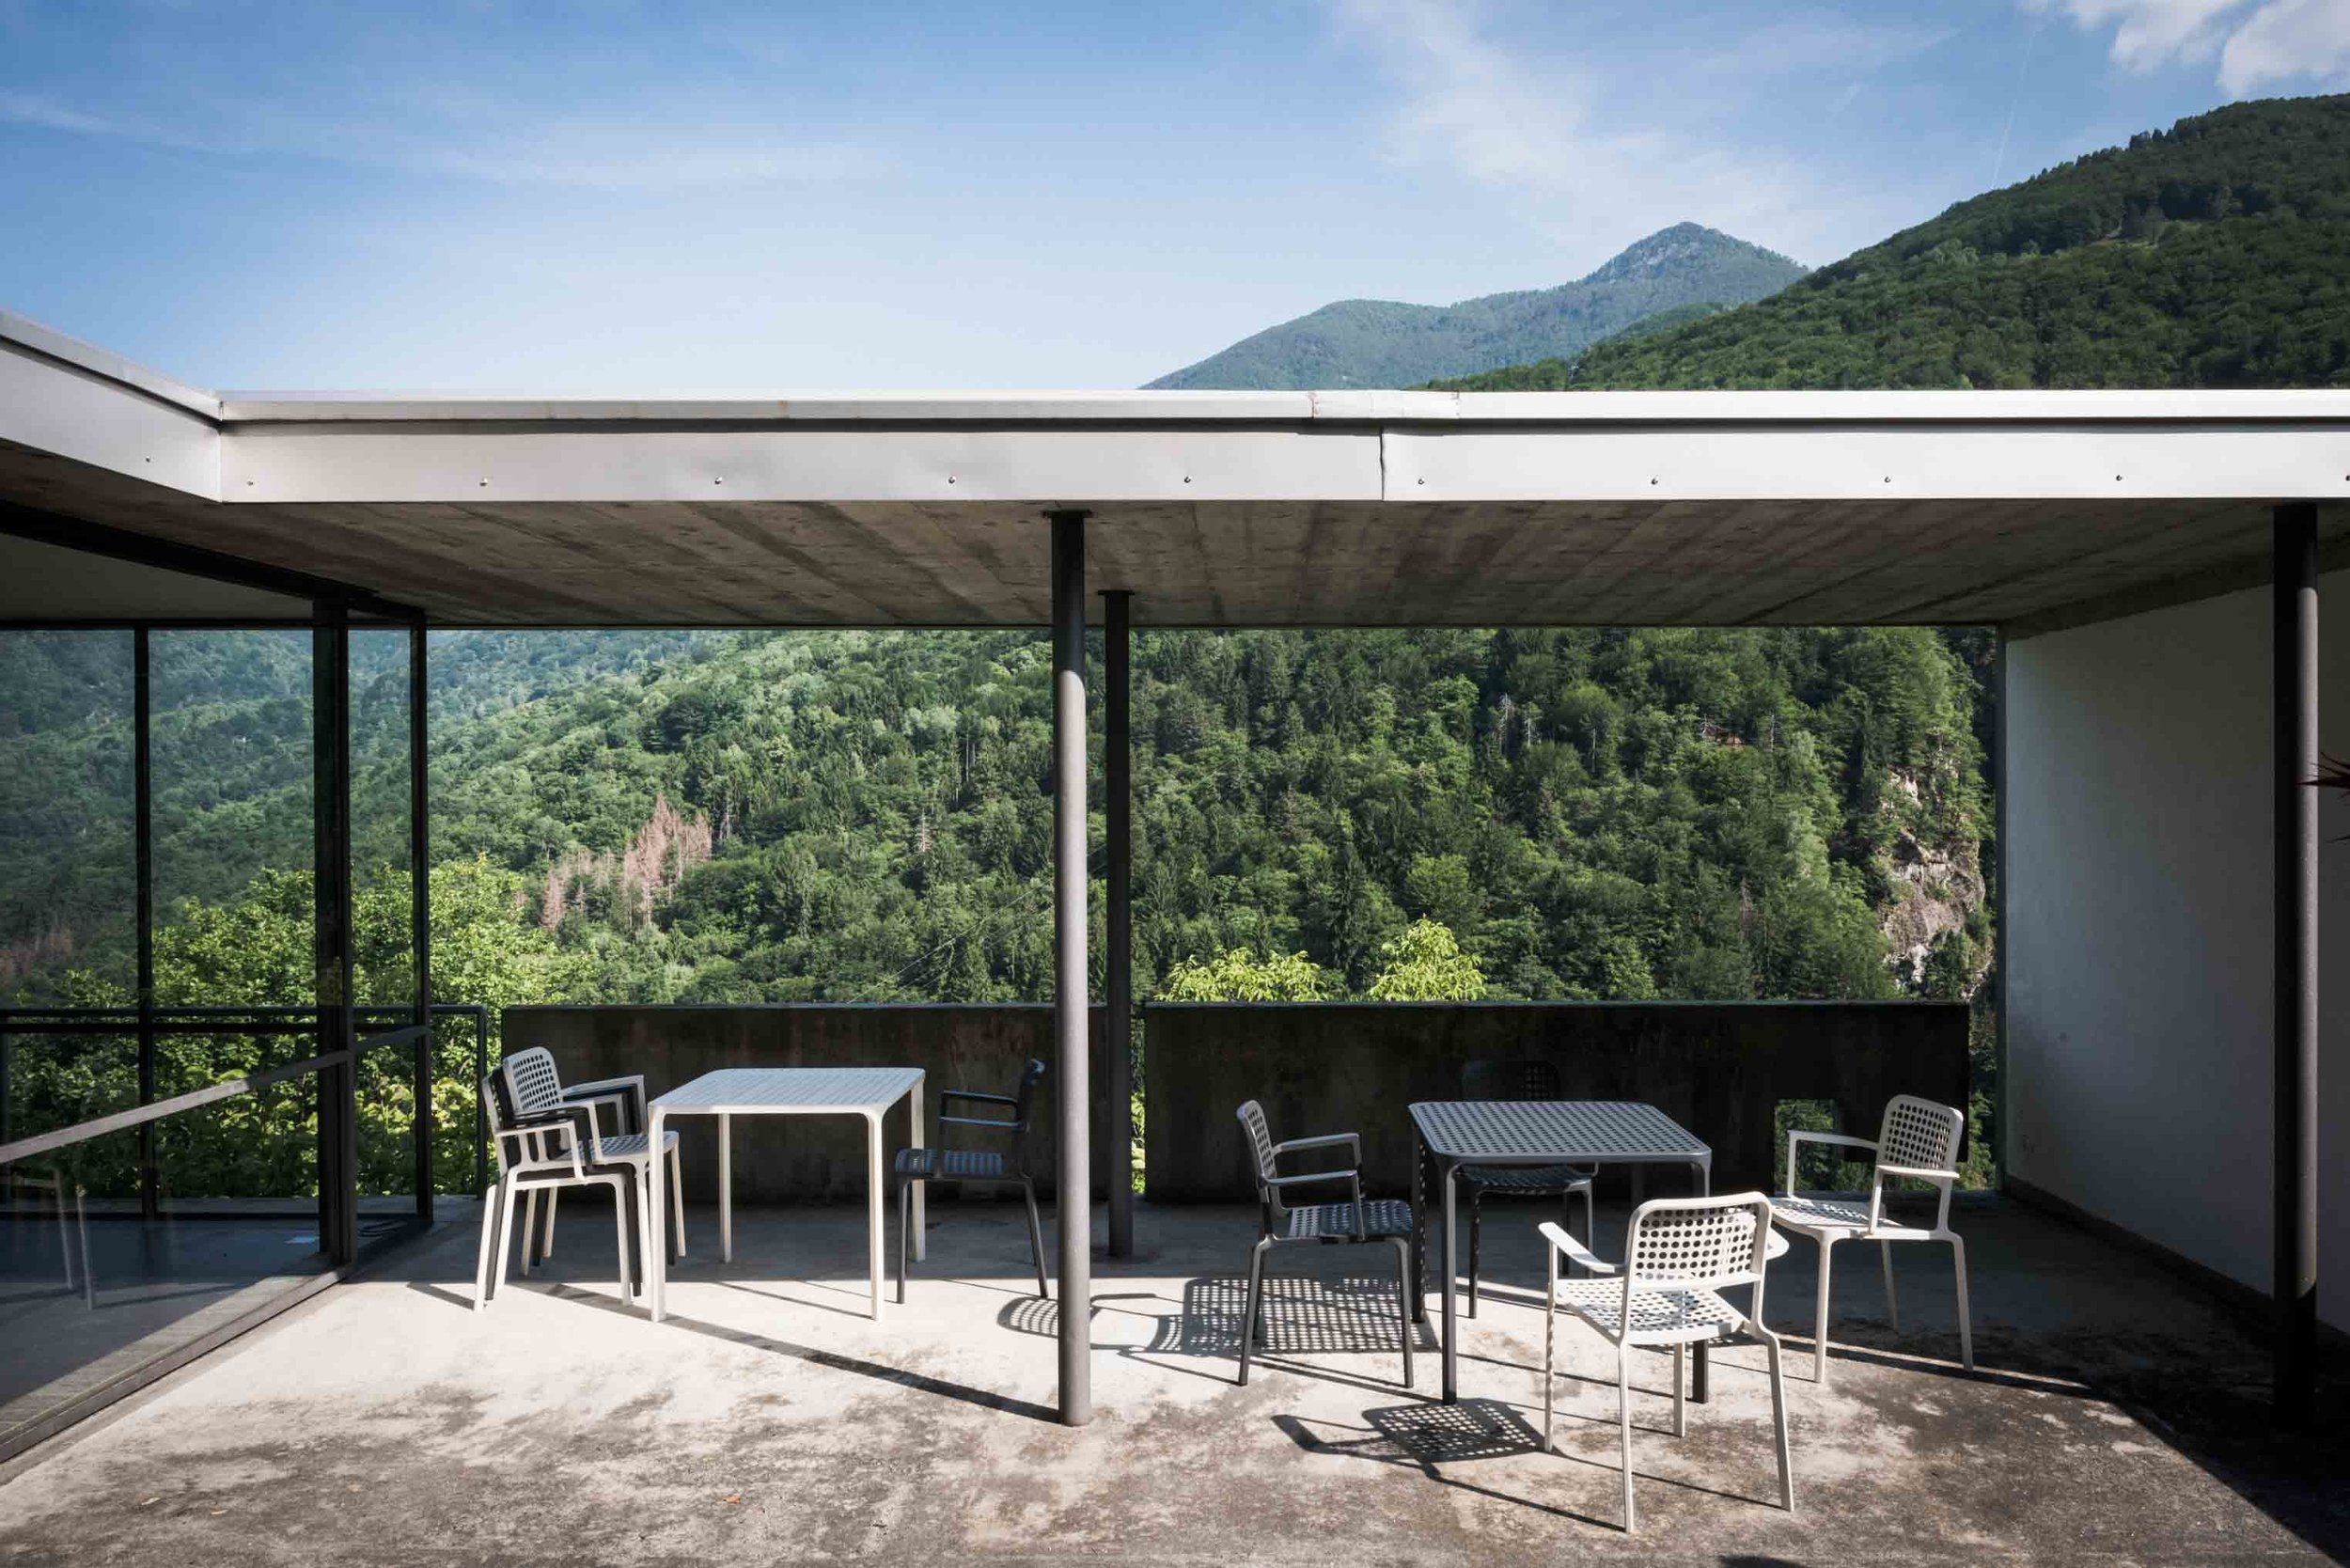 lausanne-chair-atelier-pfister-adrien-rovero-studio-10.jpg